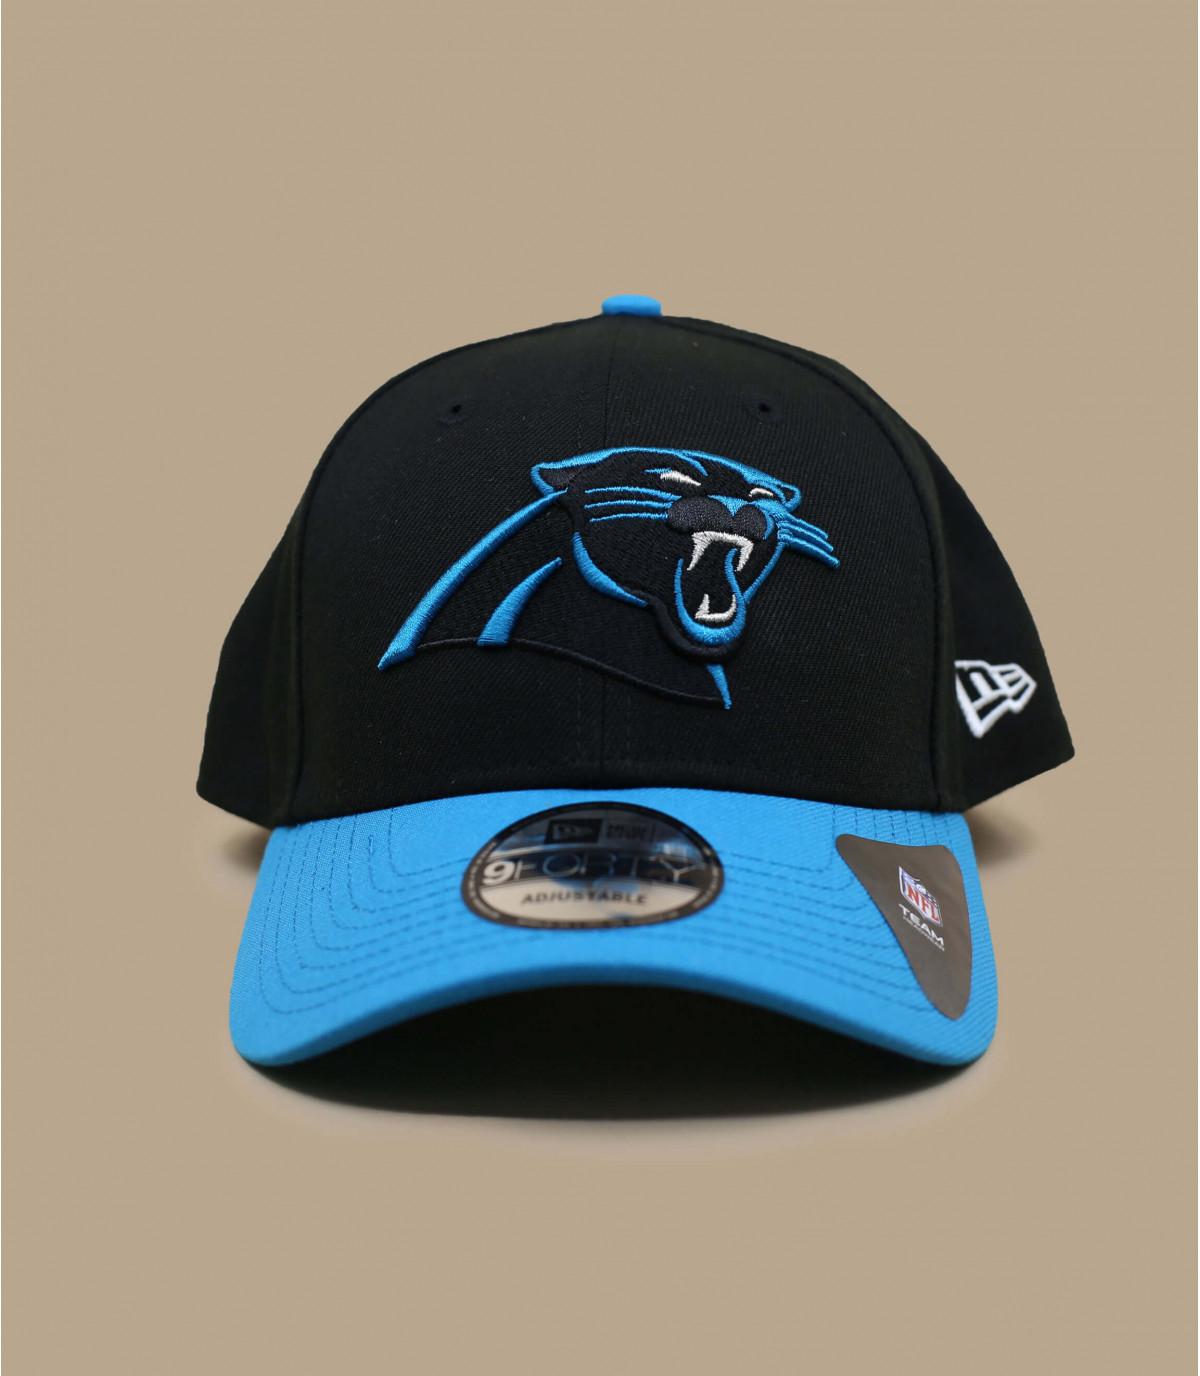 Cap Panthers Schild gebogen